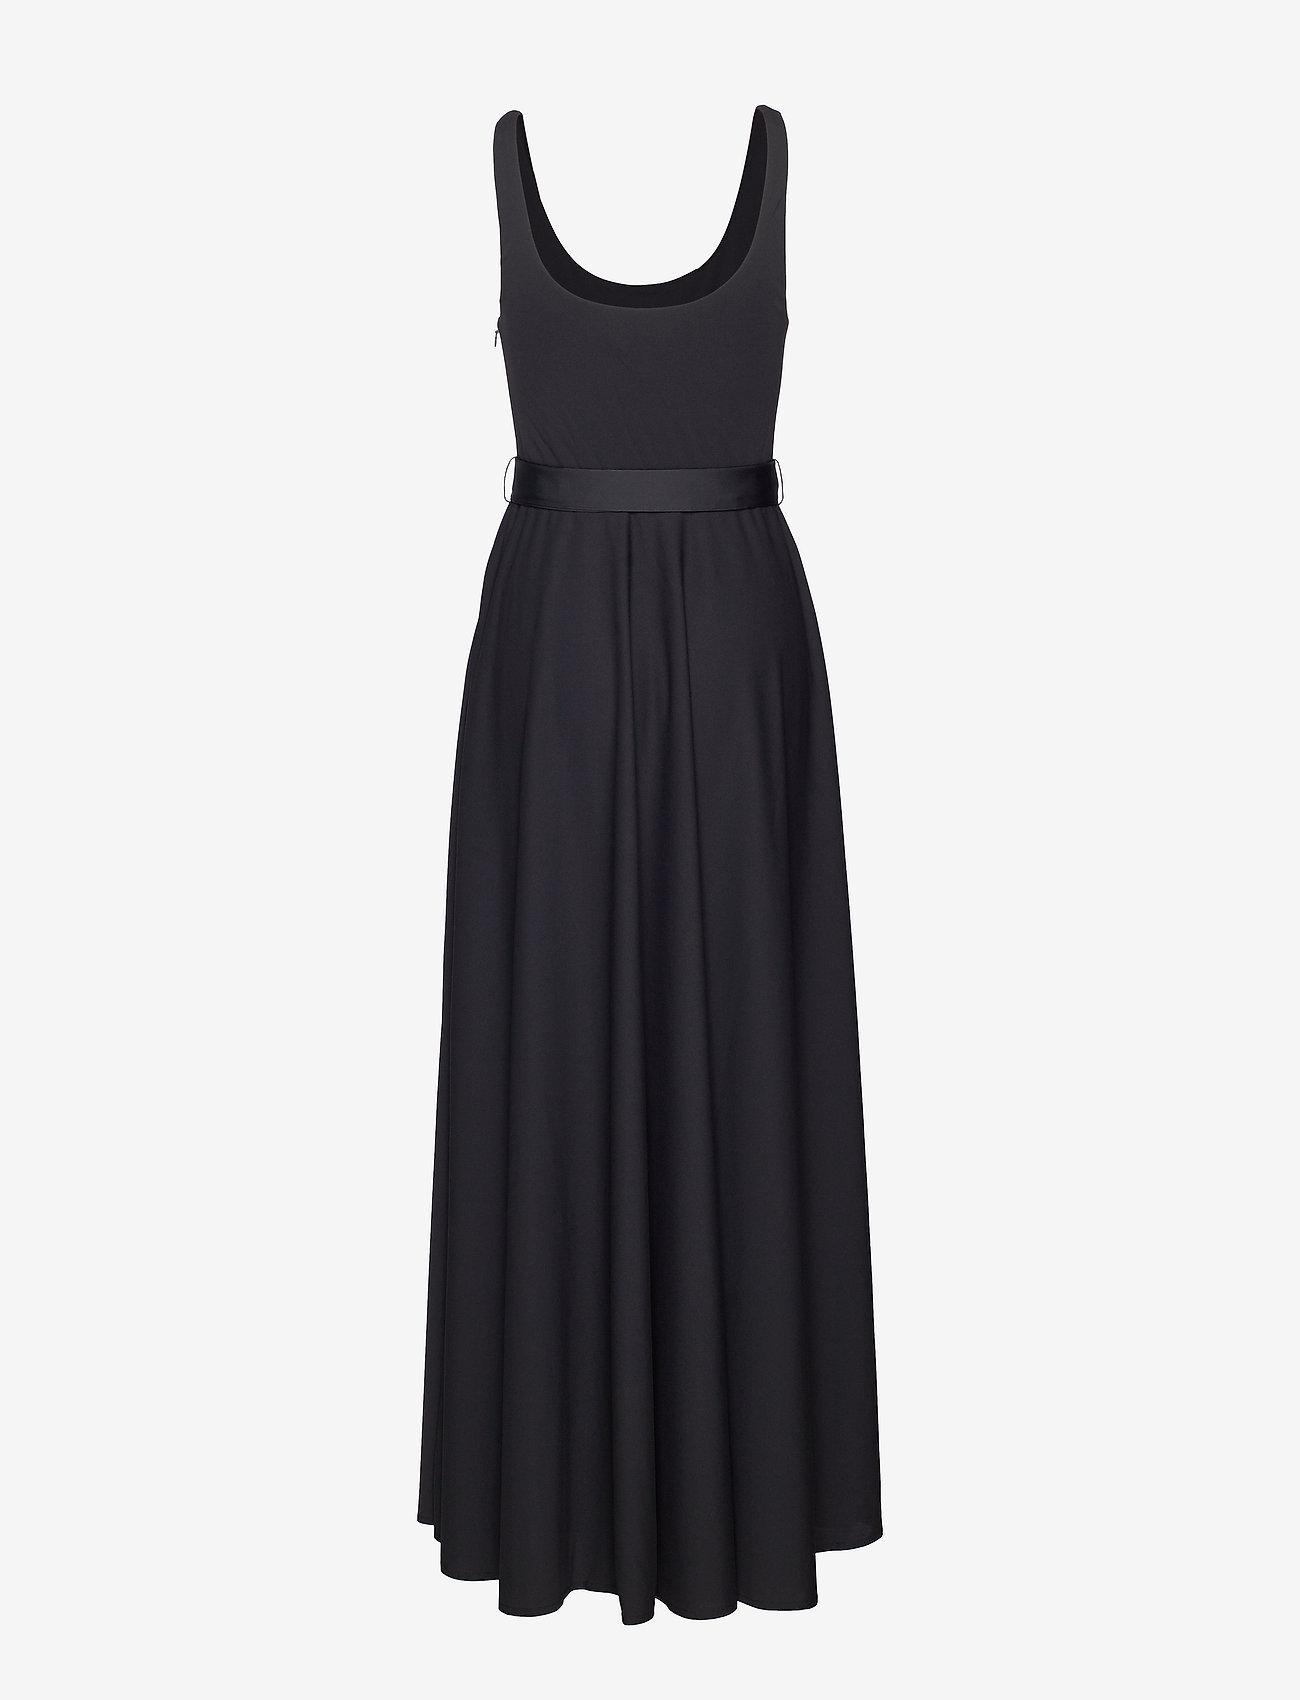 Matte Jersey-sls-csd (Polo Black) - Polo Ralph Lauren 5mFE7T